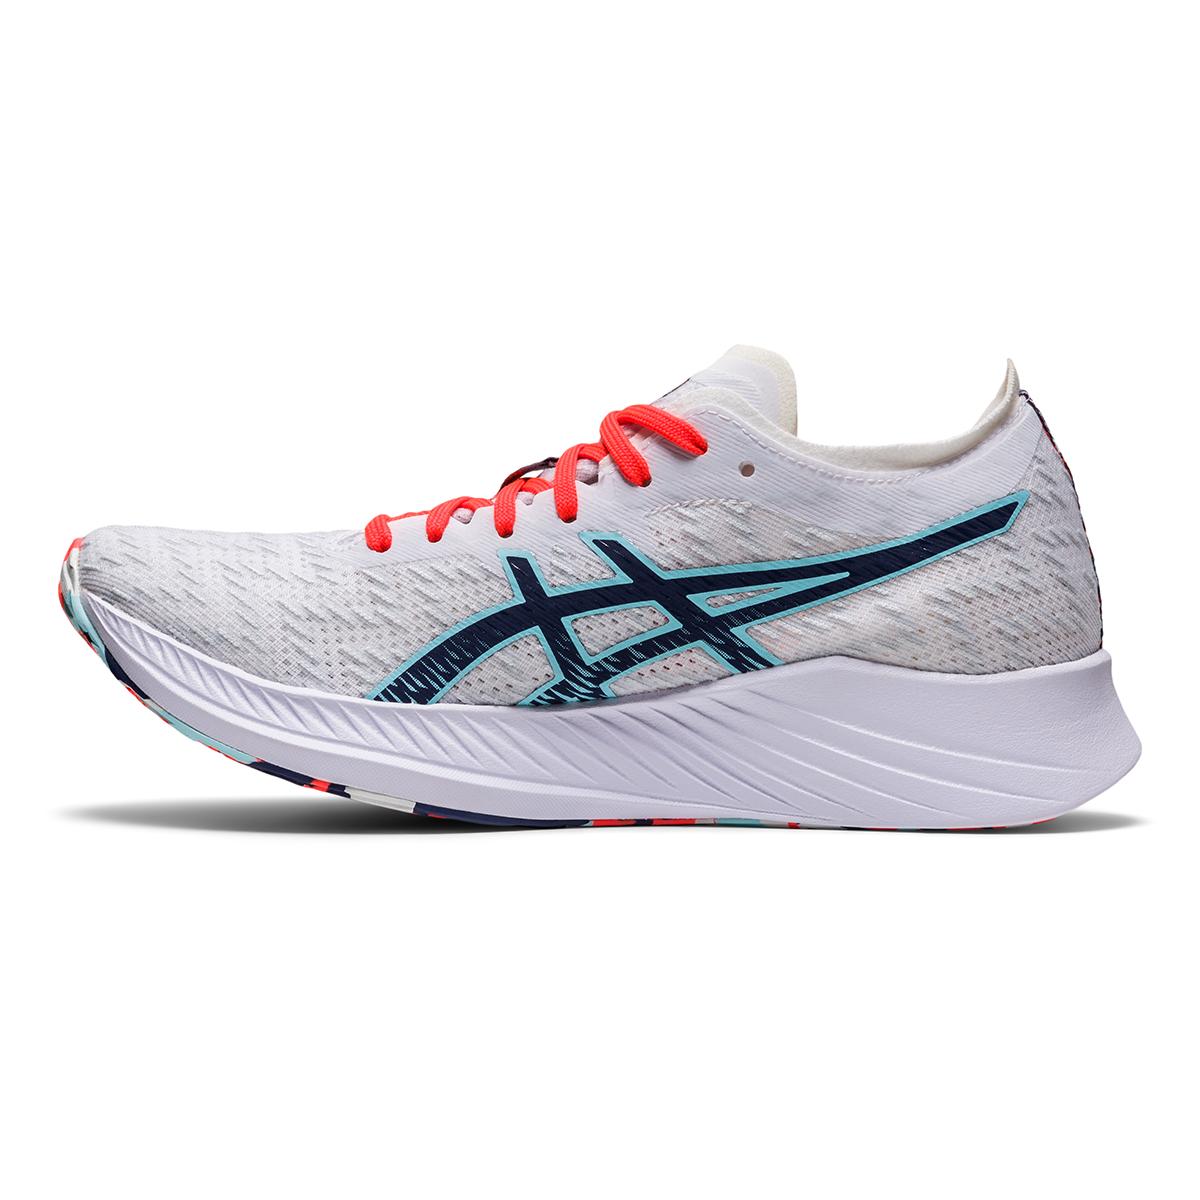 Women's Asics Magic Speed Running Shoe - Color: White/Thunder Blue - Size: 5 - Width: Regular, White/Thunder Blue, large, image 2